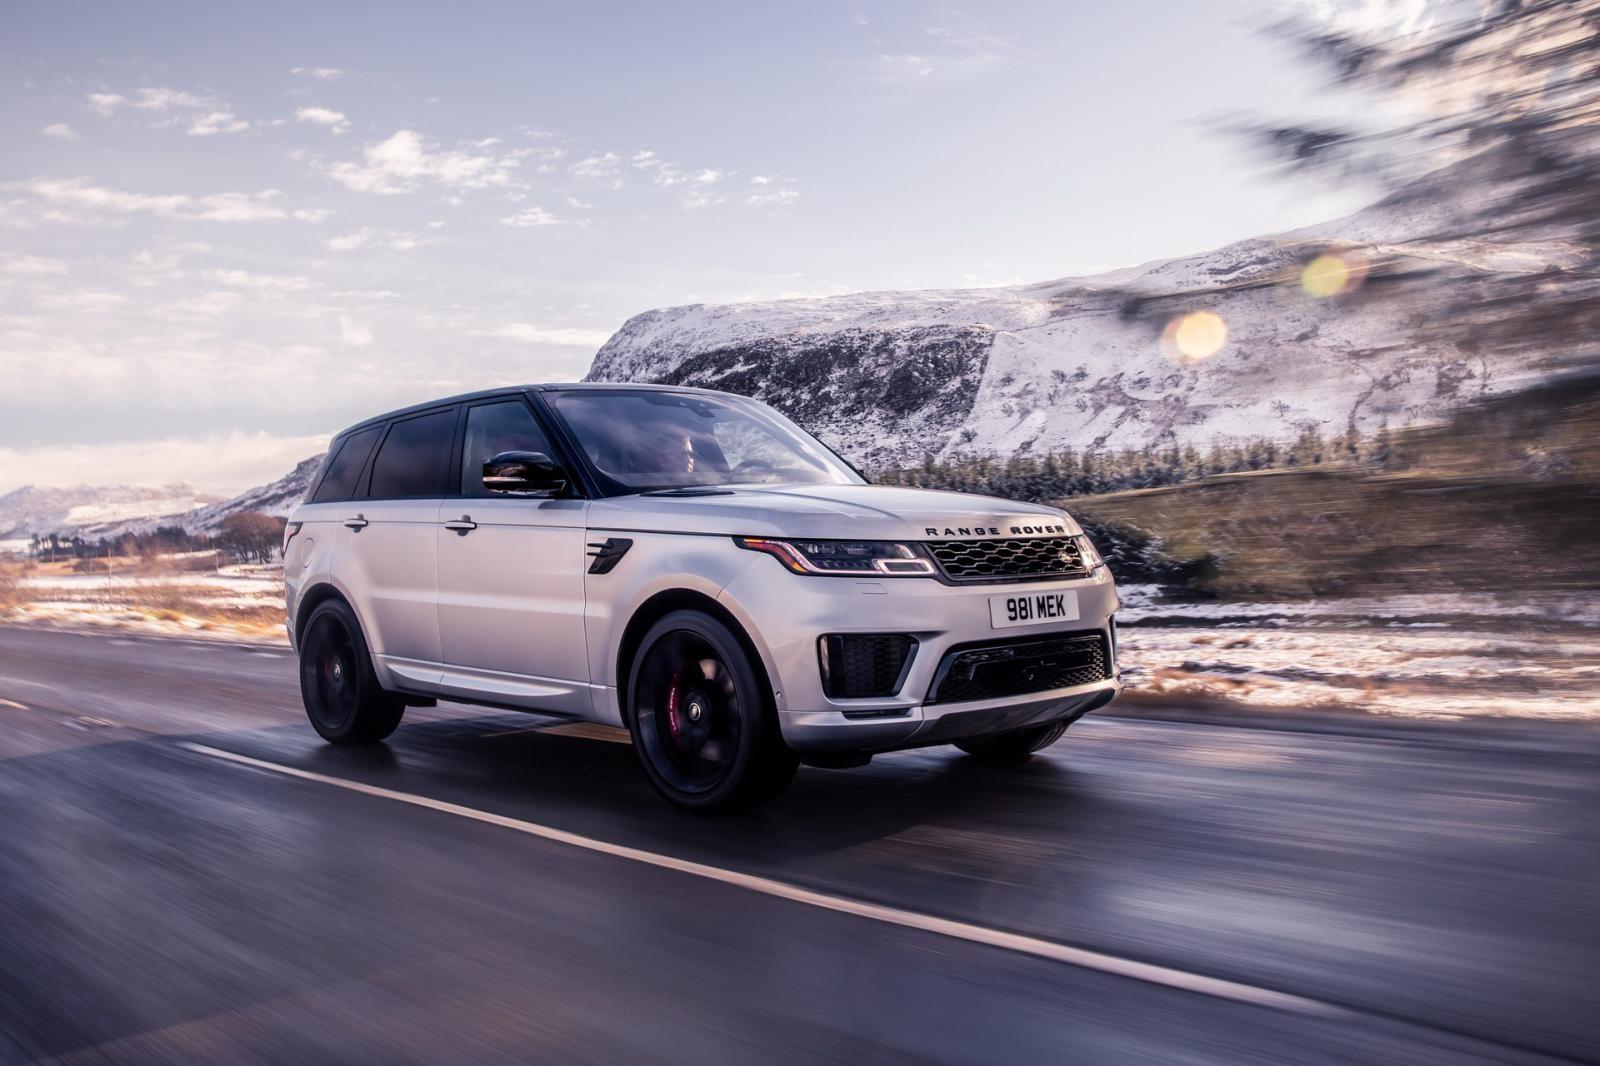 Range Rover Sport HST 2019 mới ra mắt